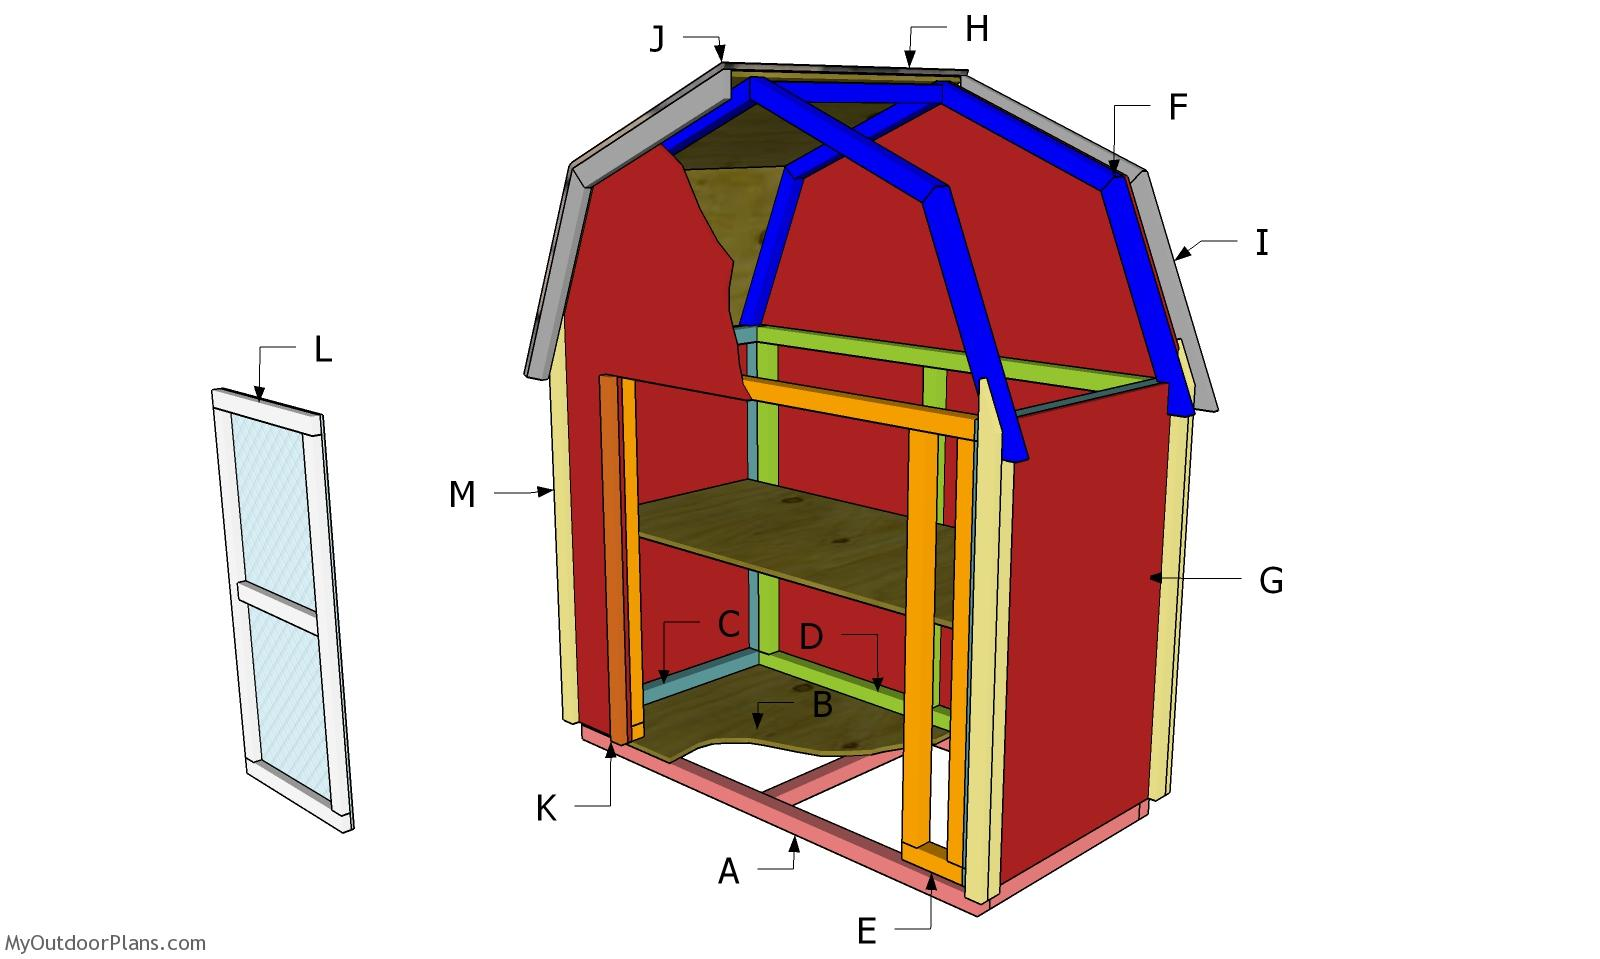 2x4 Barn Display Case Plans - Part 2